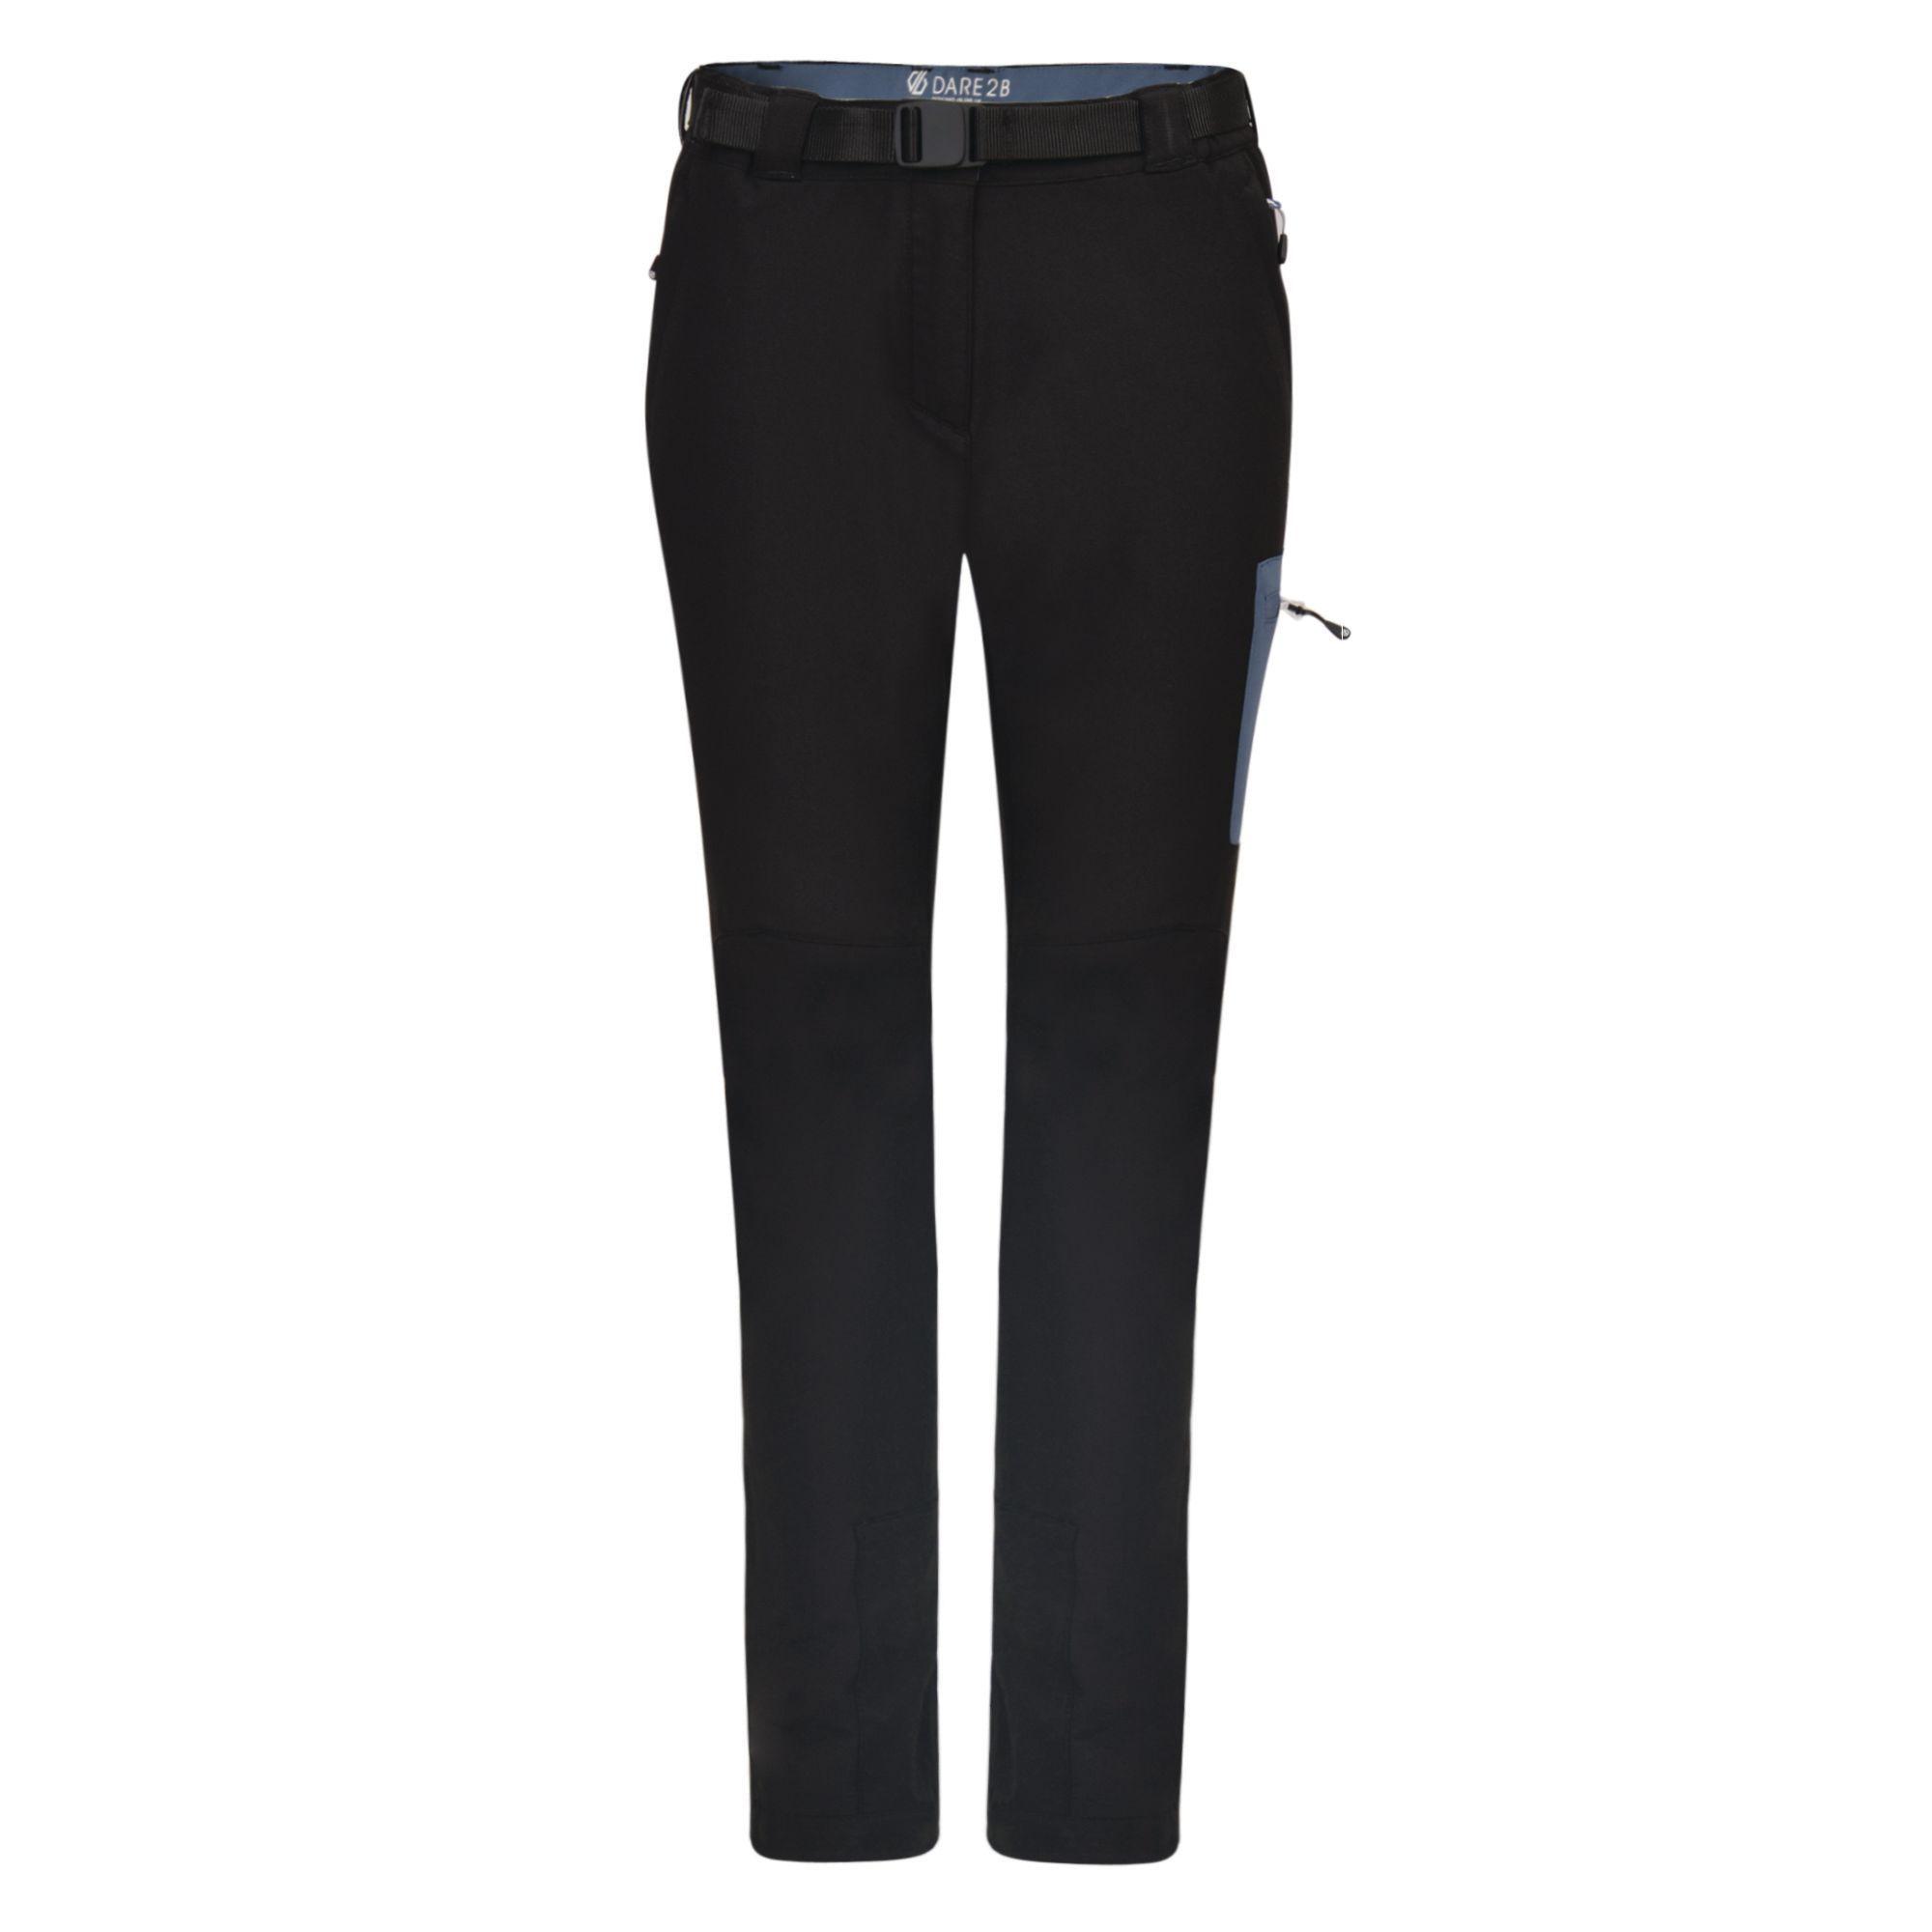 Dare 2B Womens/Ladies Revify Walking Trousers